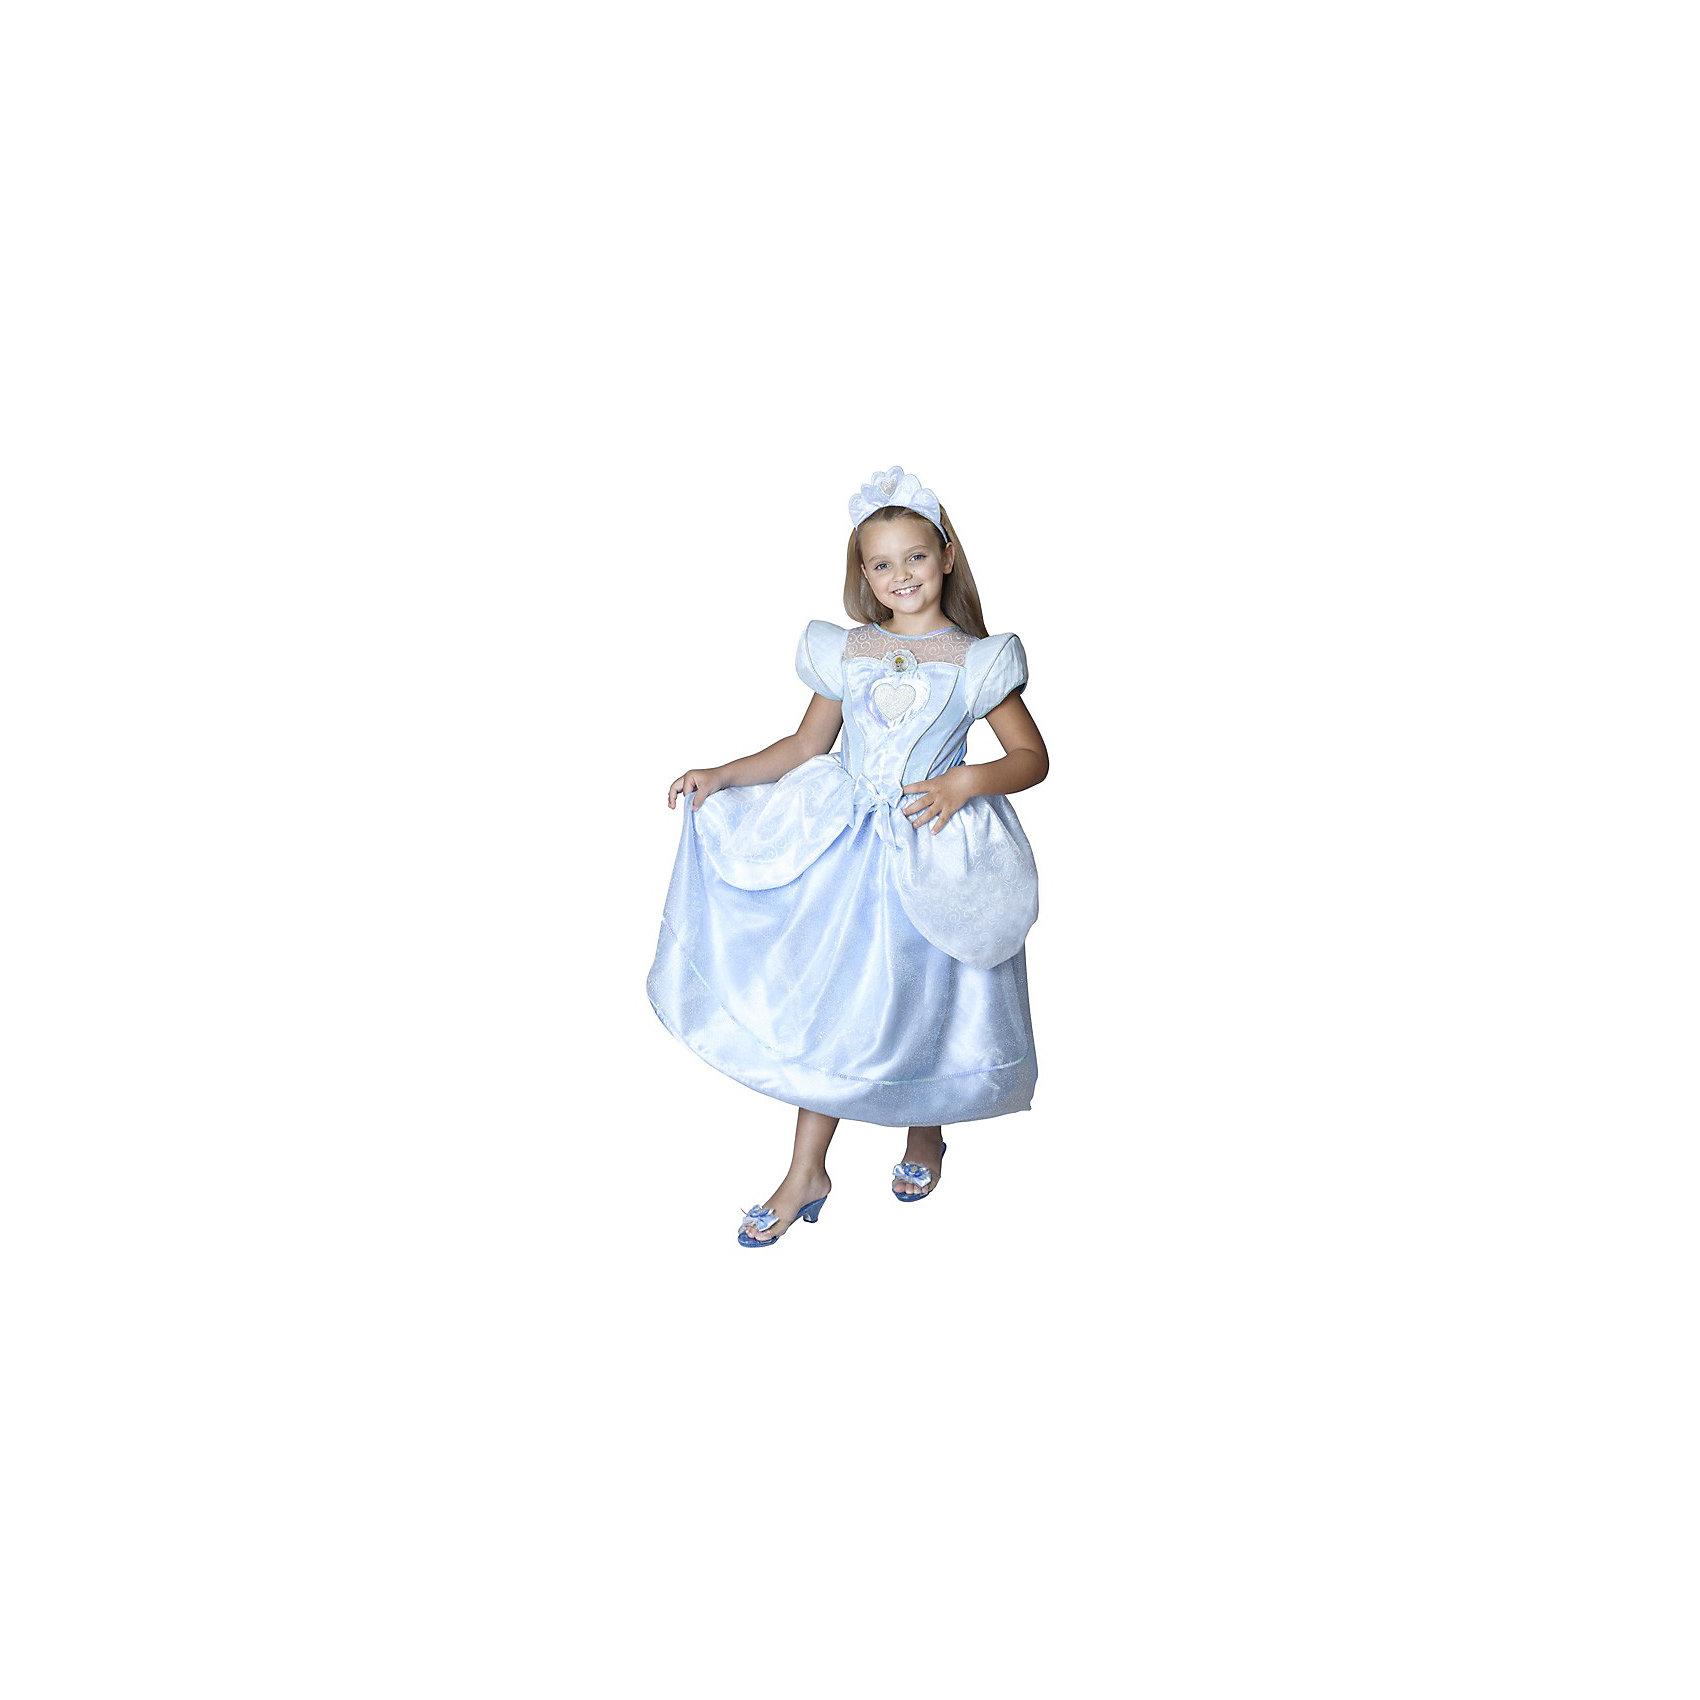 Christys Christys 104 - 128 Премиум-костюм Золушка с тиарой